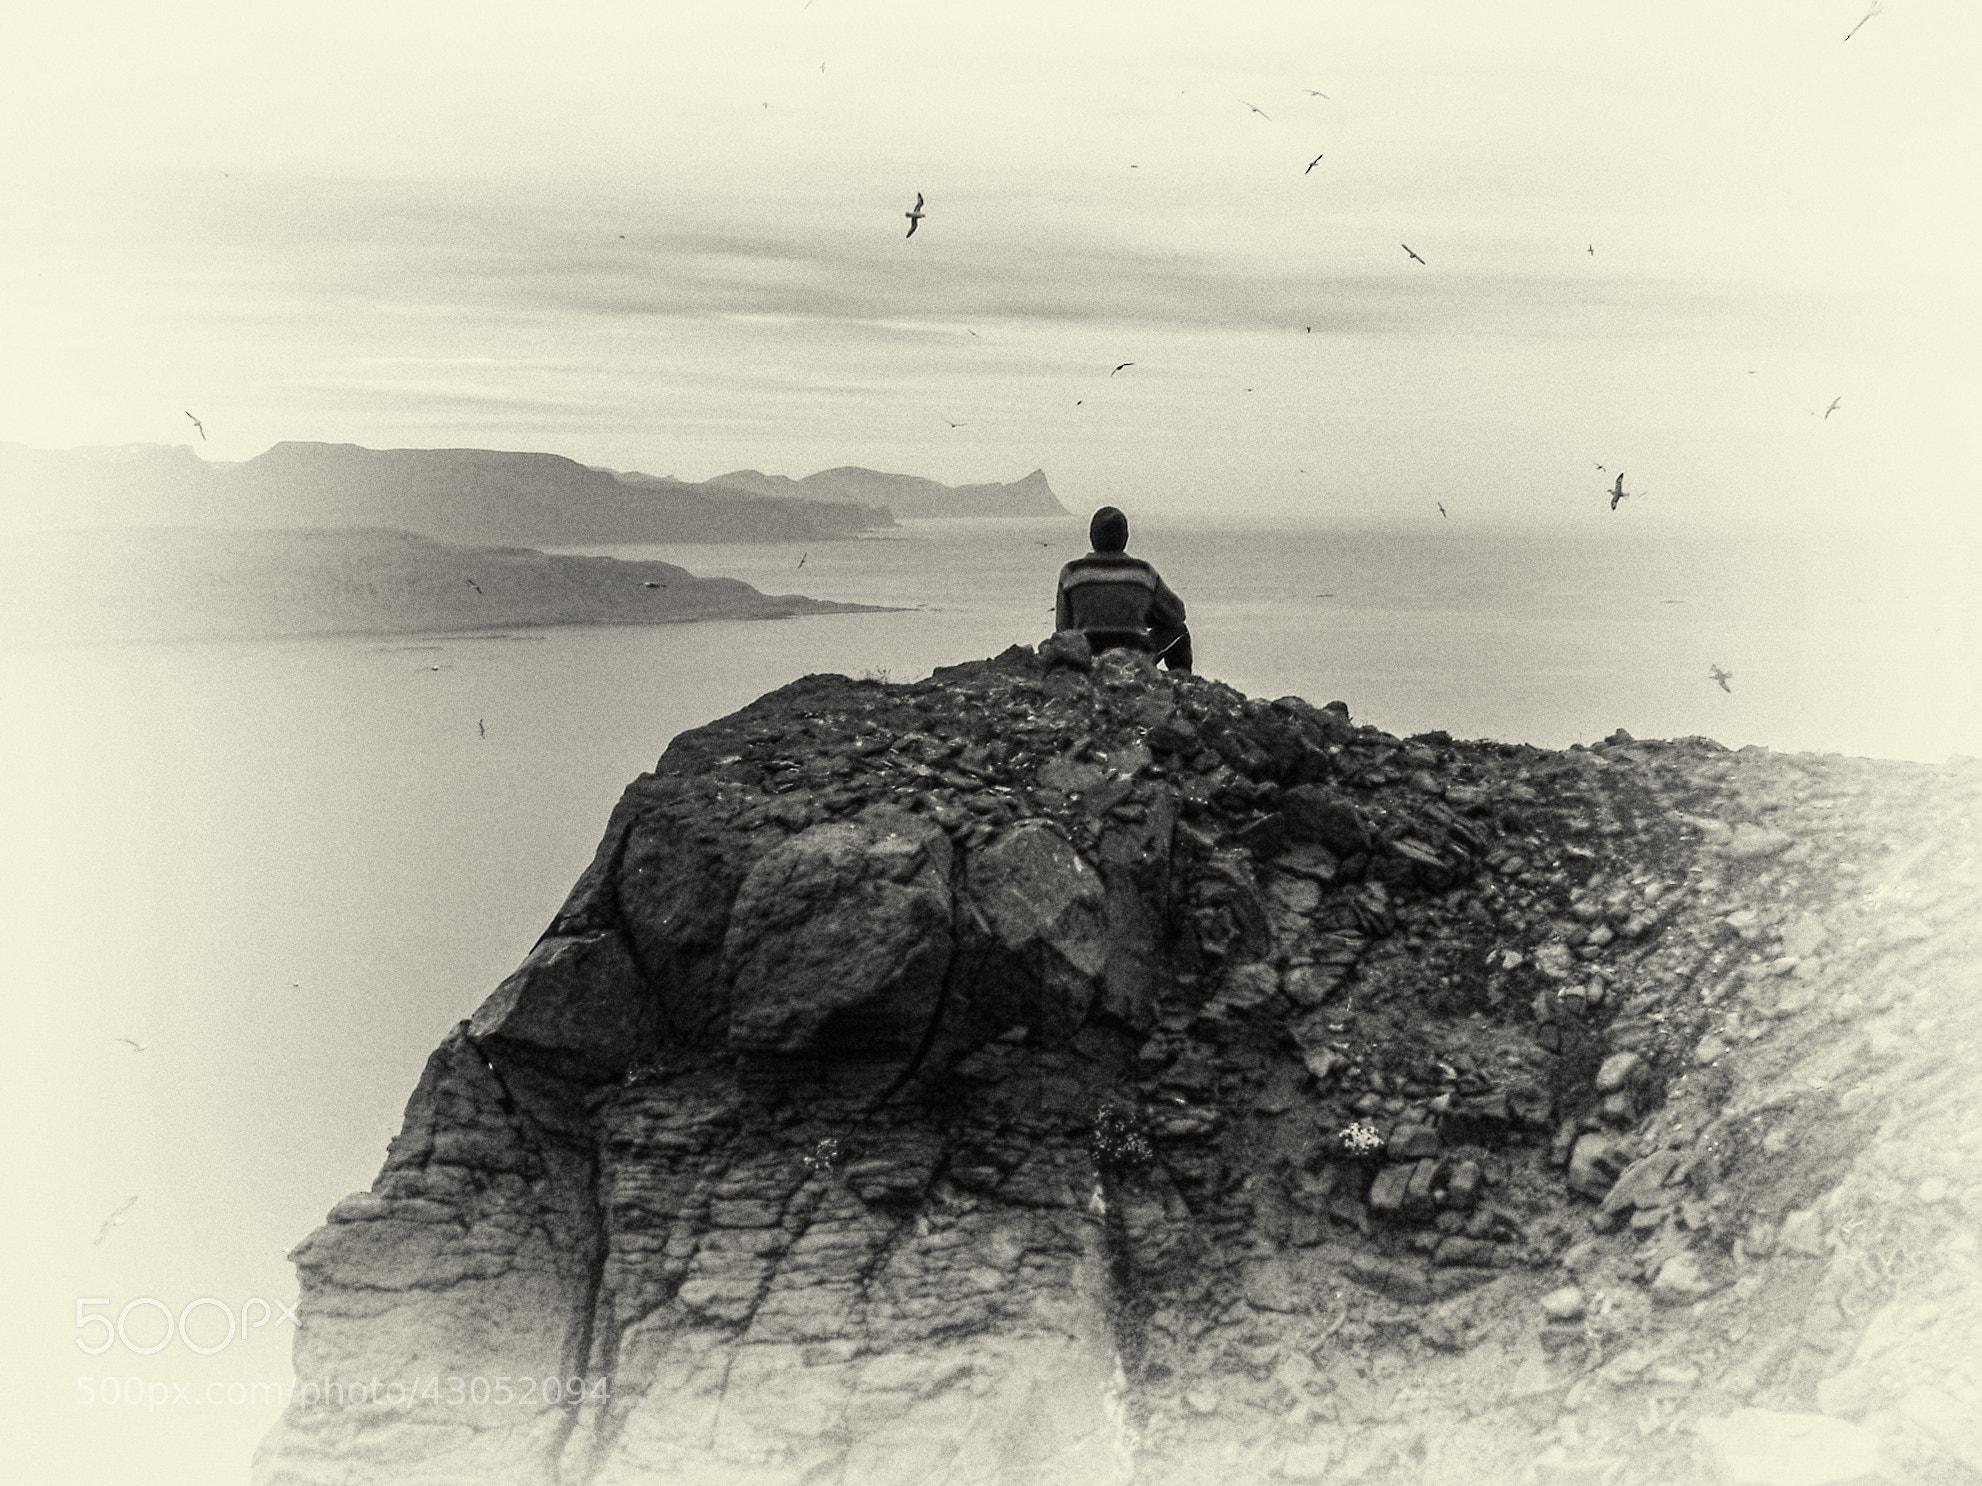 Photograph A wonderful world. by Ragnar Thorarensen on 500px